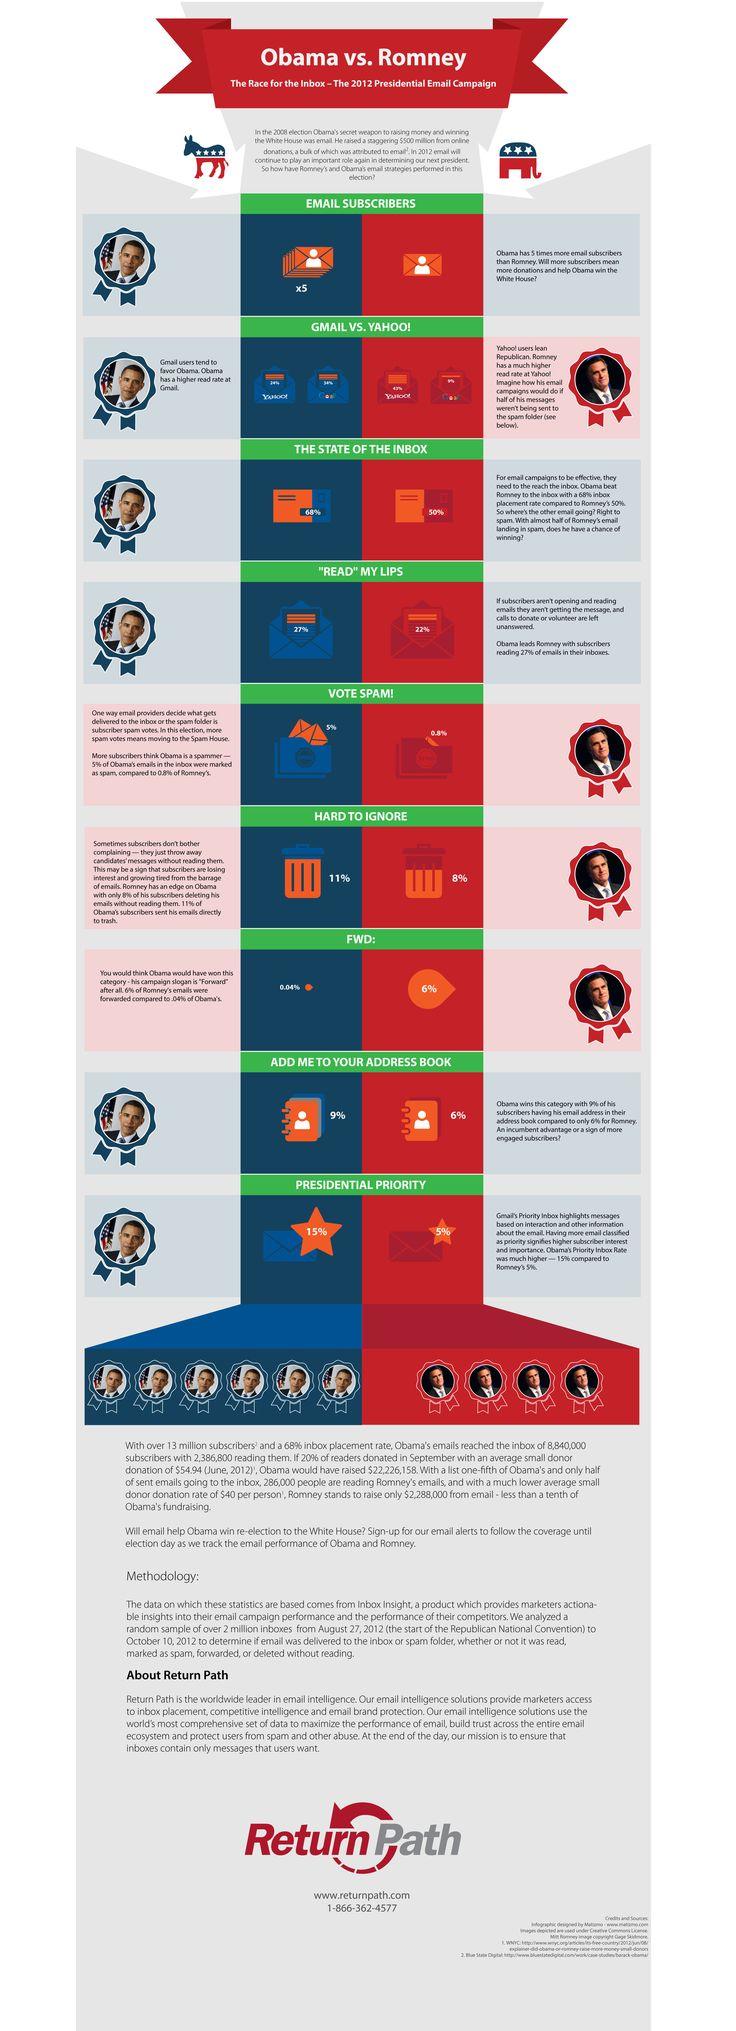 Emails: Barack Obama vs. Mitt Romney